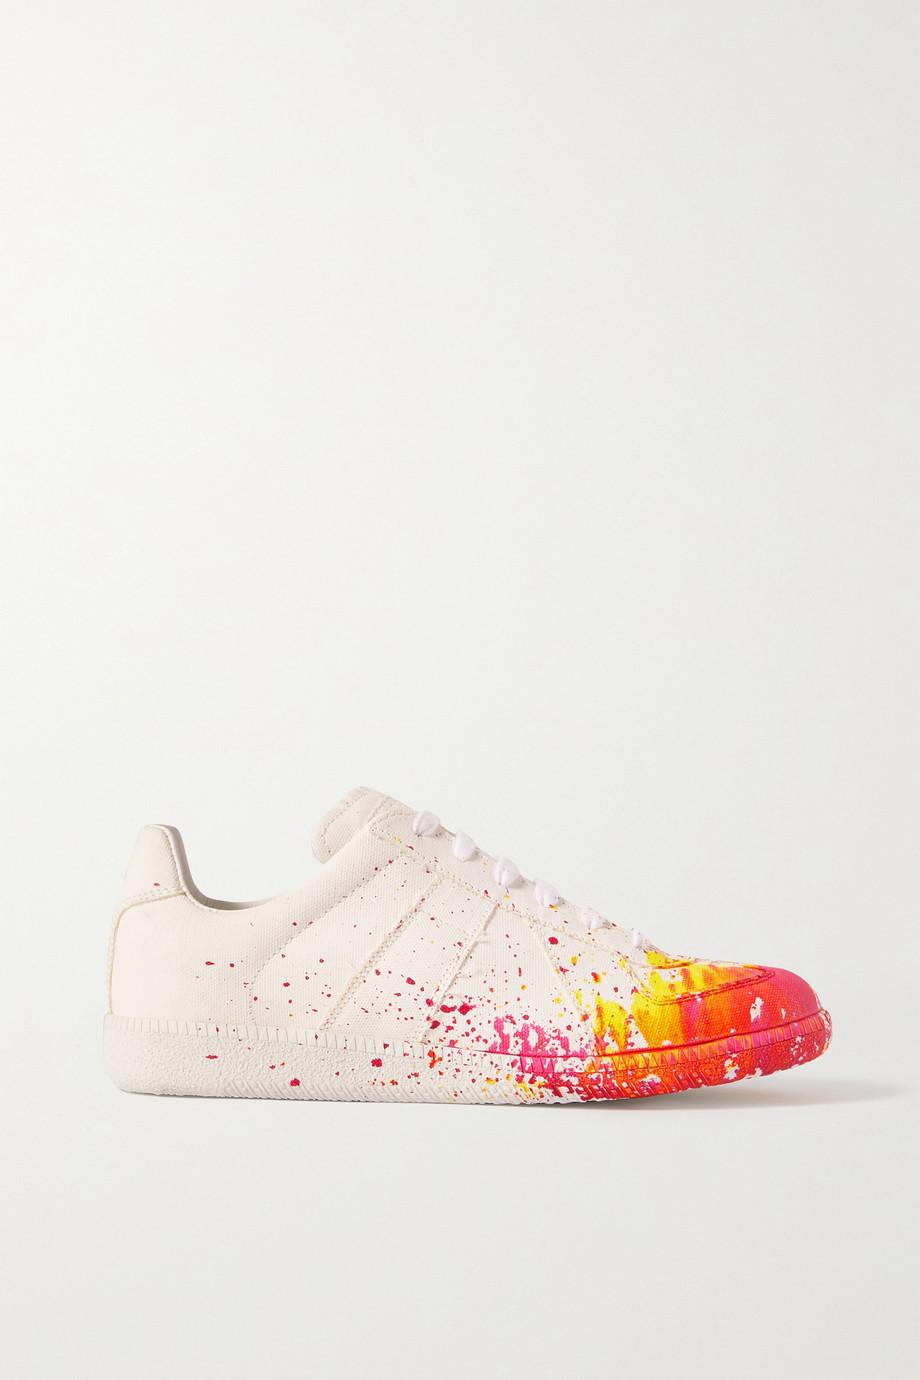 Maison Margiela Replica printed cotton-canvas sneakers